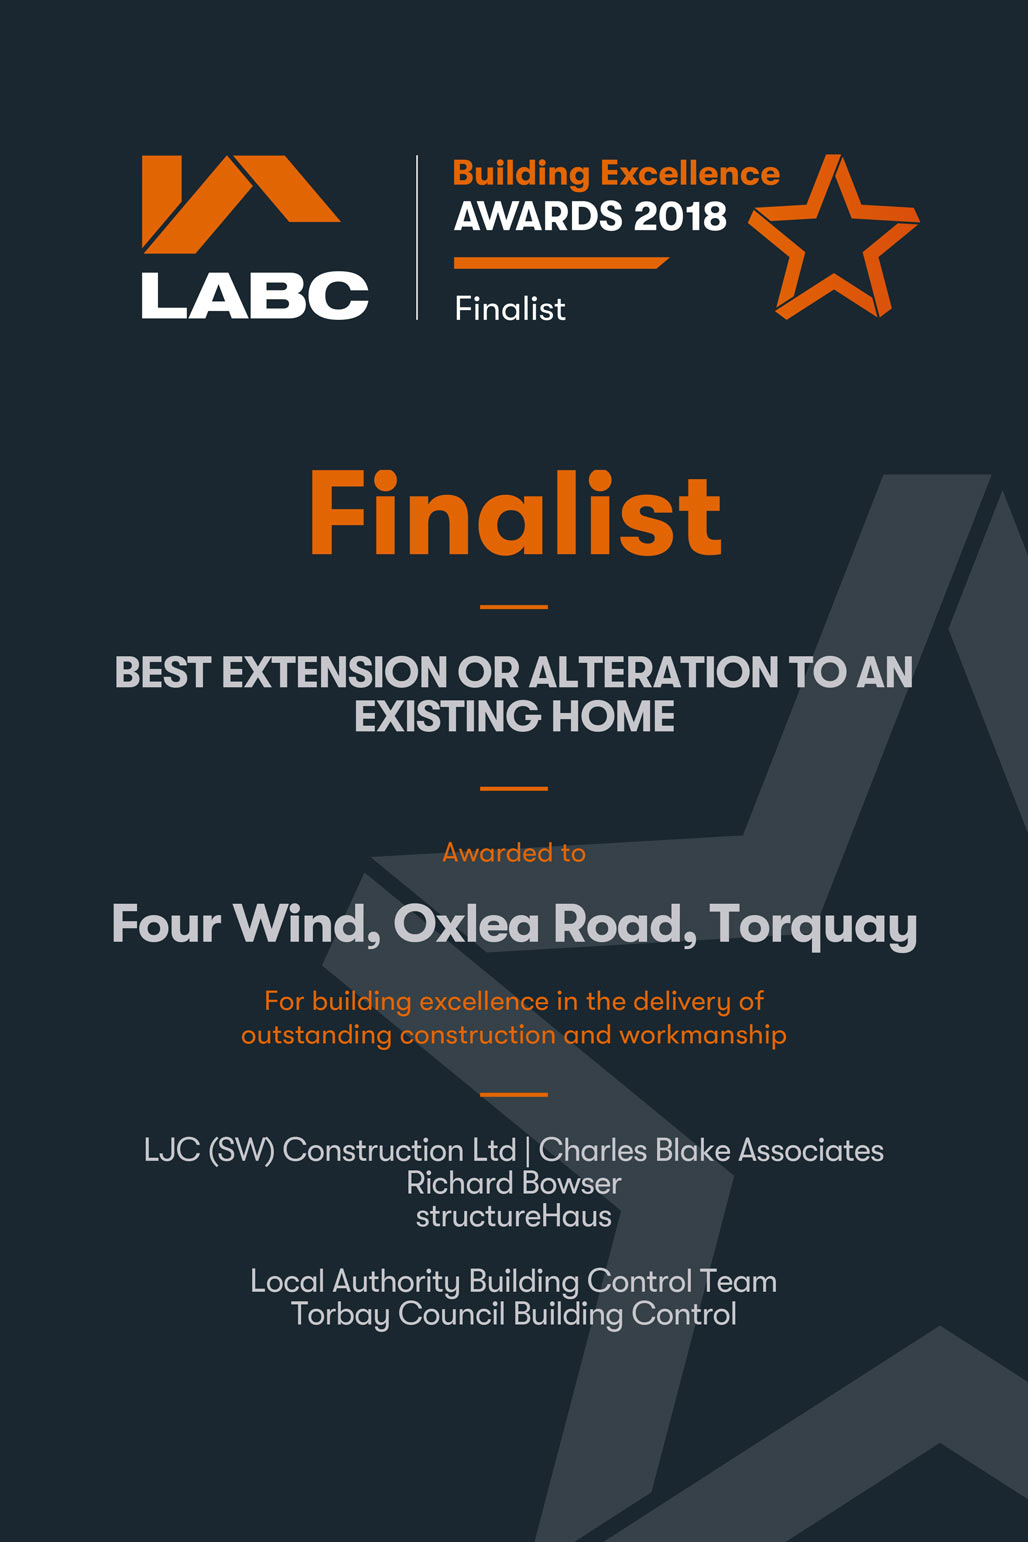 labc-finalist-award-image.jpg